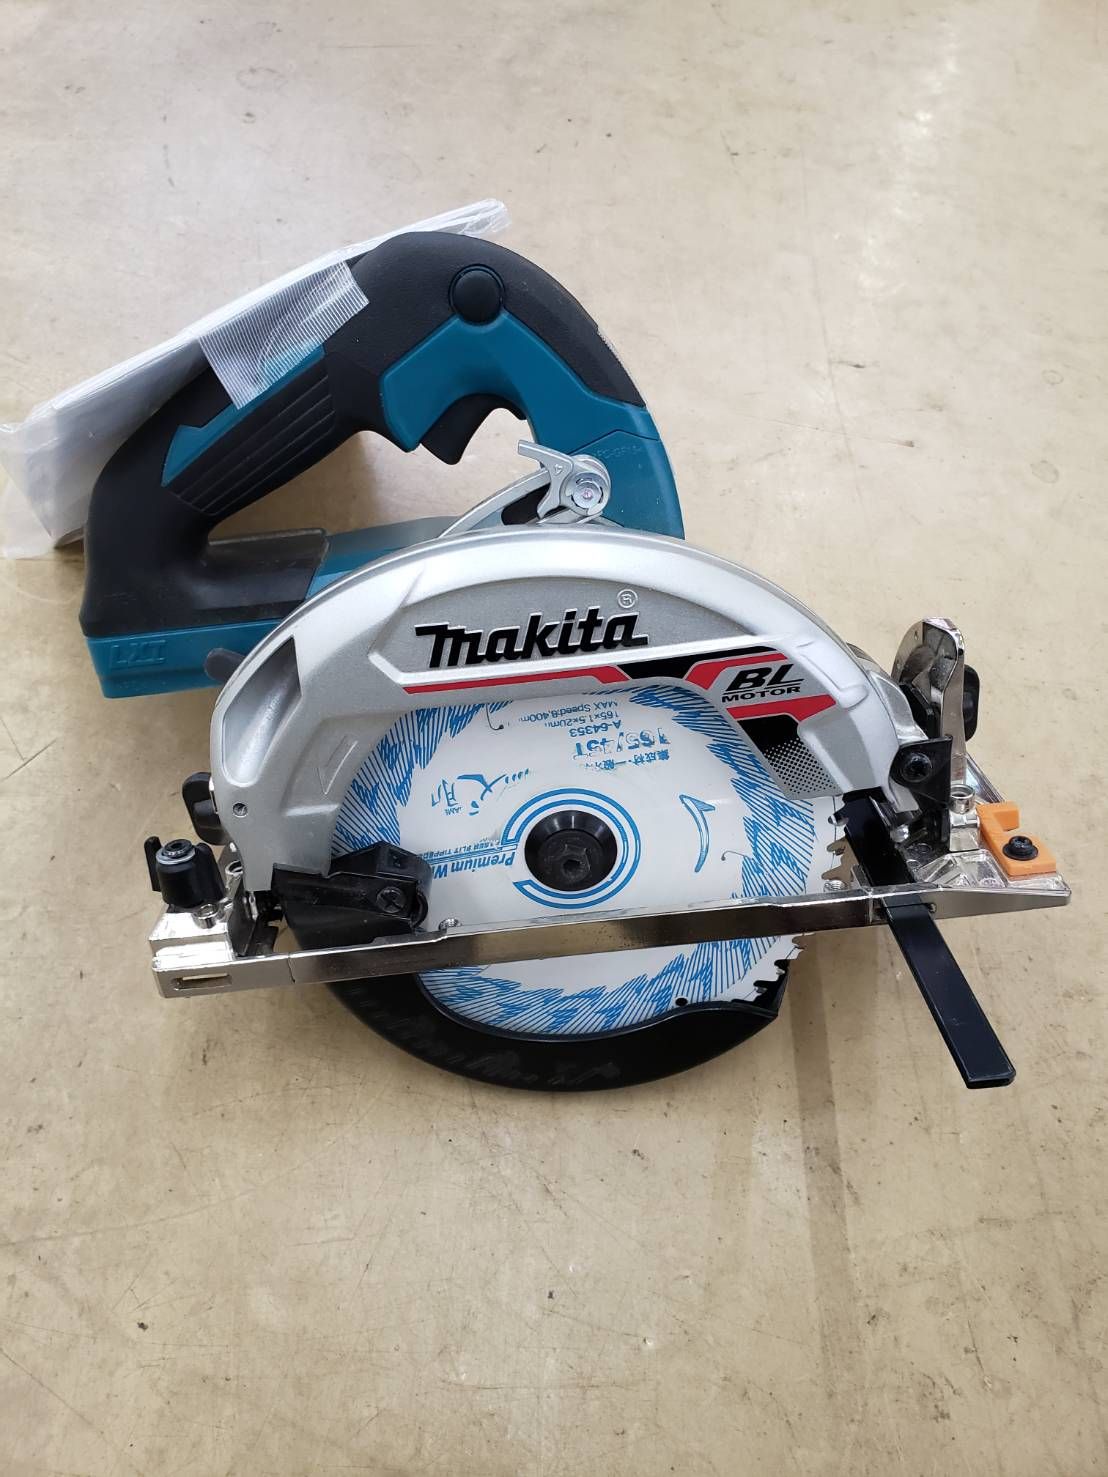 makita / マキタ 充電式丸ノコ HS631D 2019年製 説明書付き 美品 買取致しました!の買取-